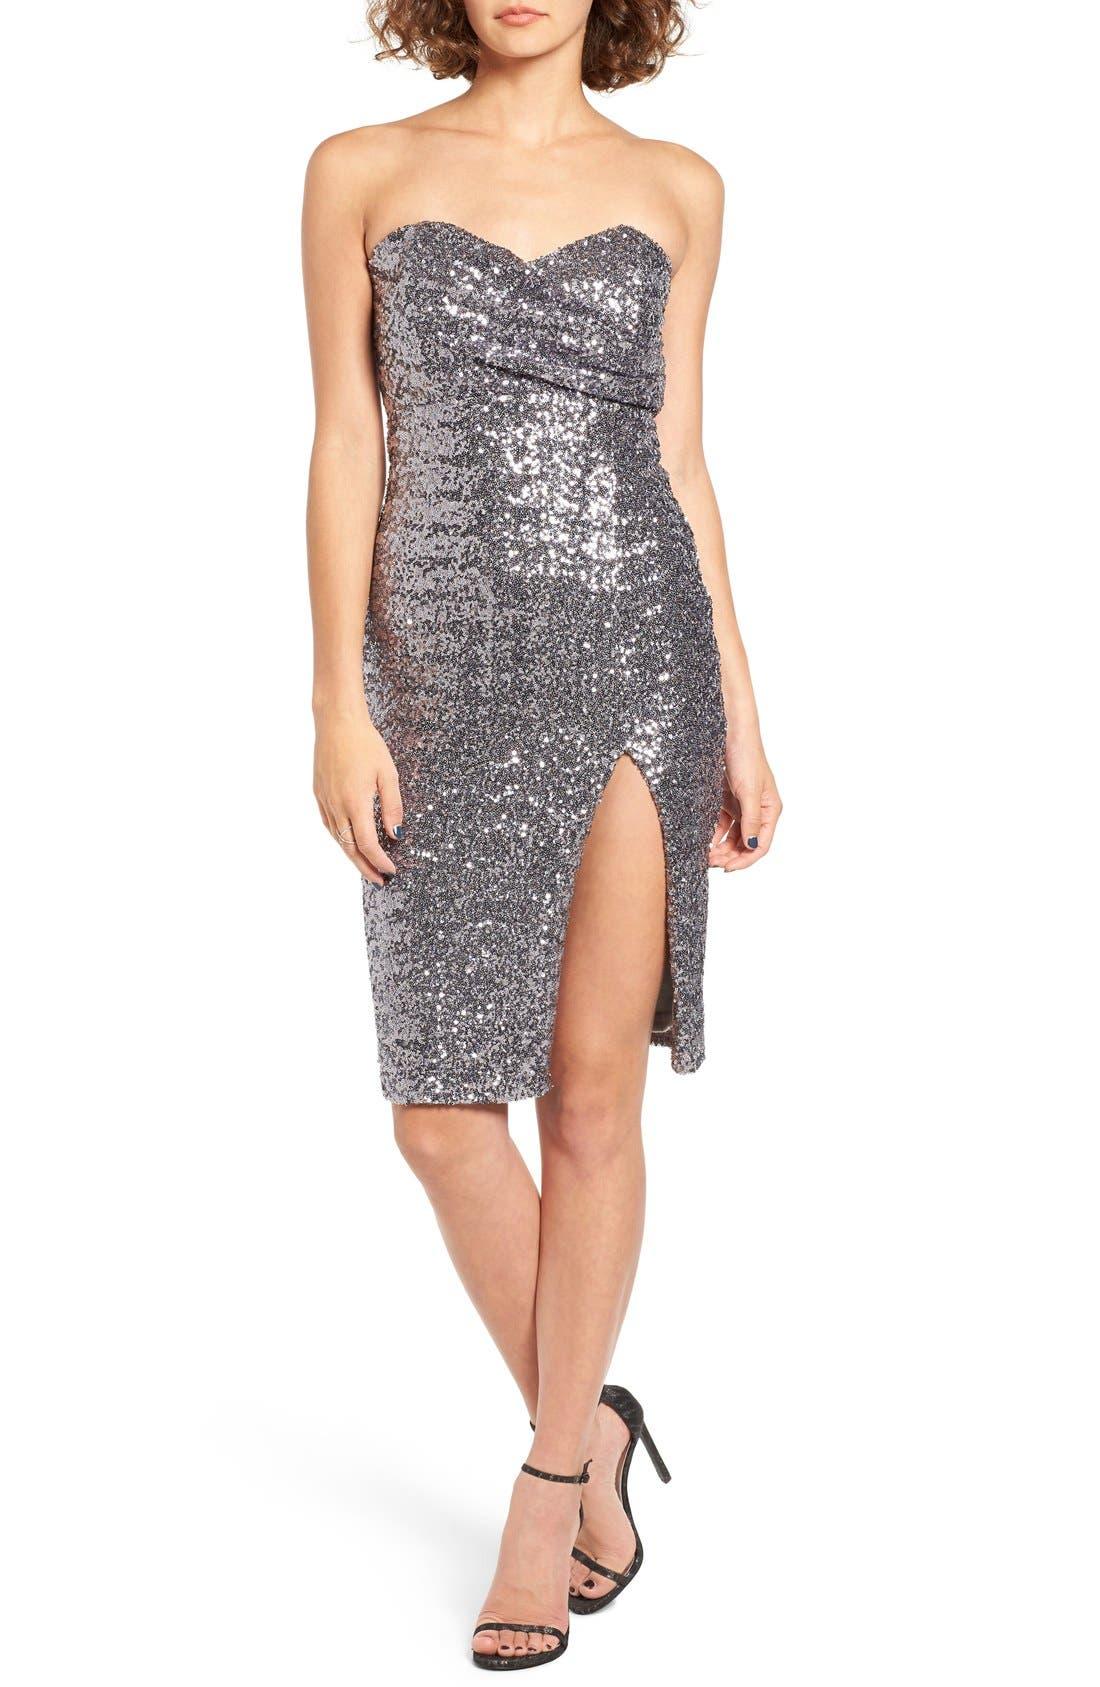 Alternate Image 1 Selected - TFNC Cirilla Strapless Sequin Dress